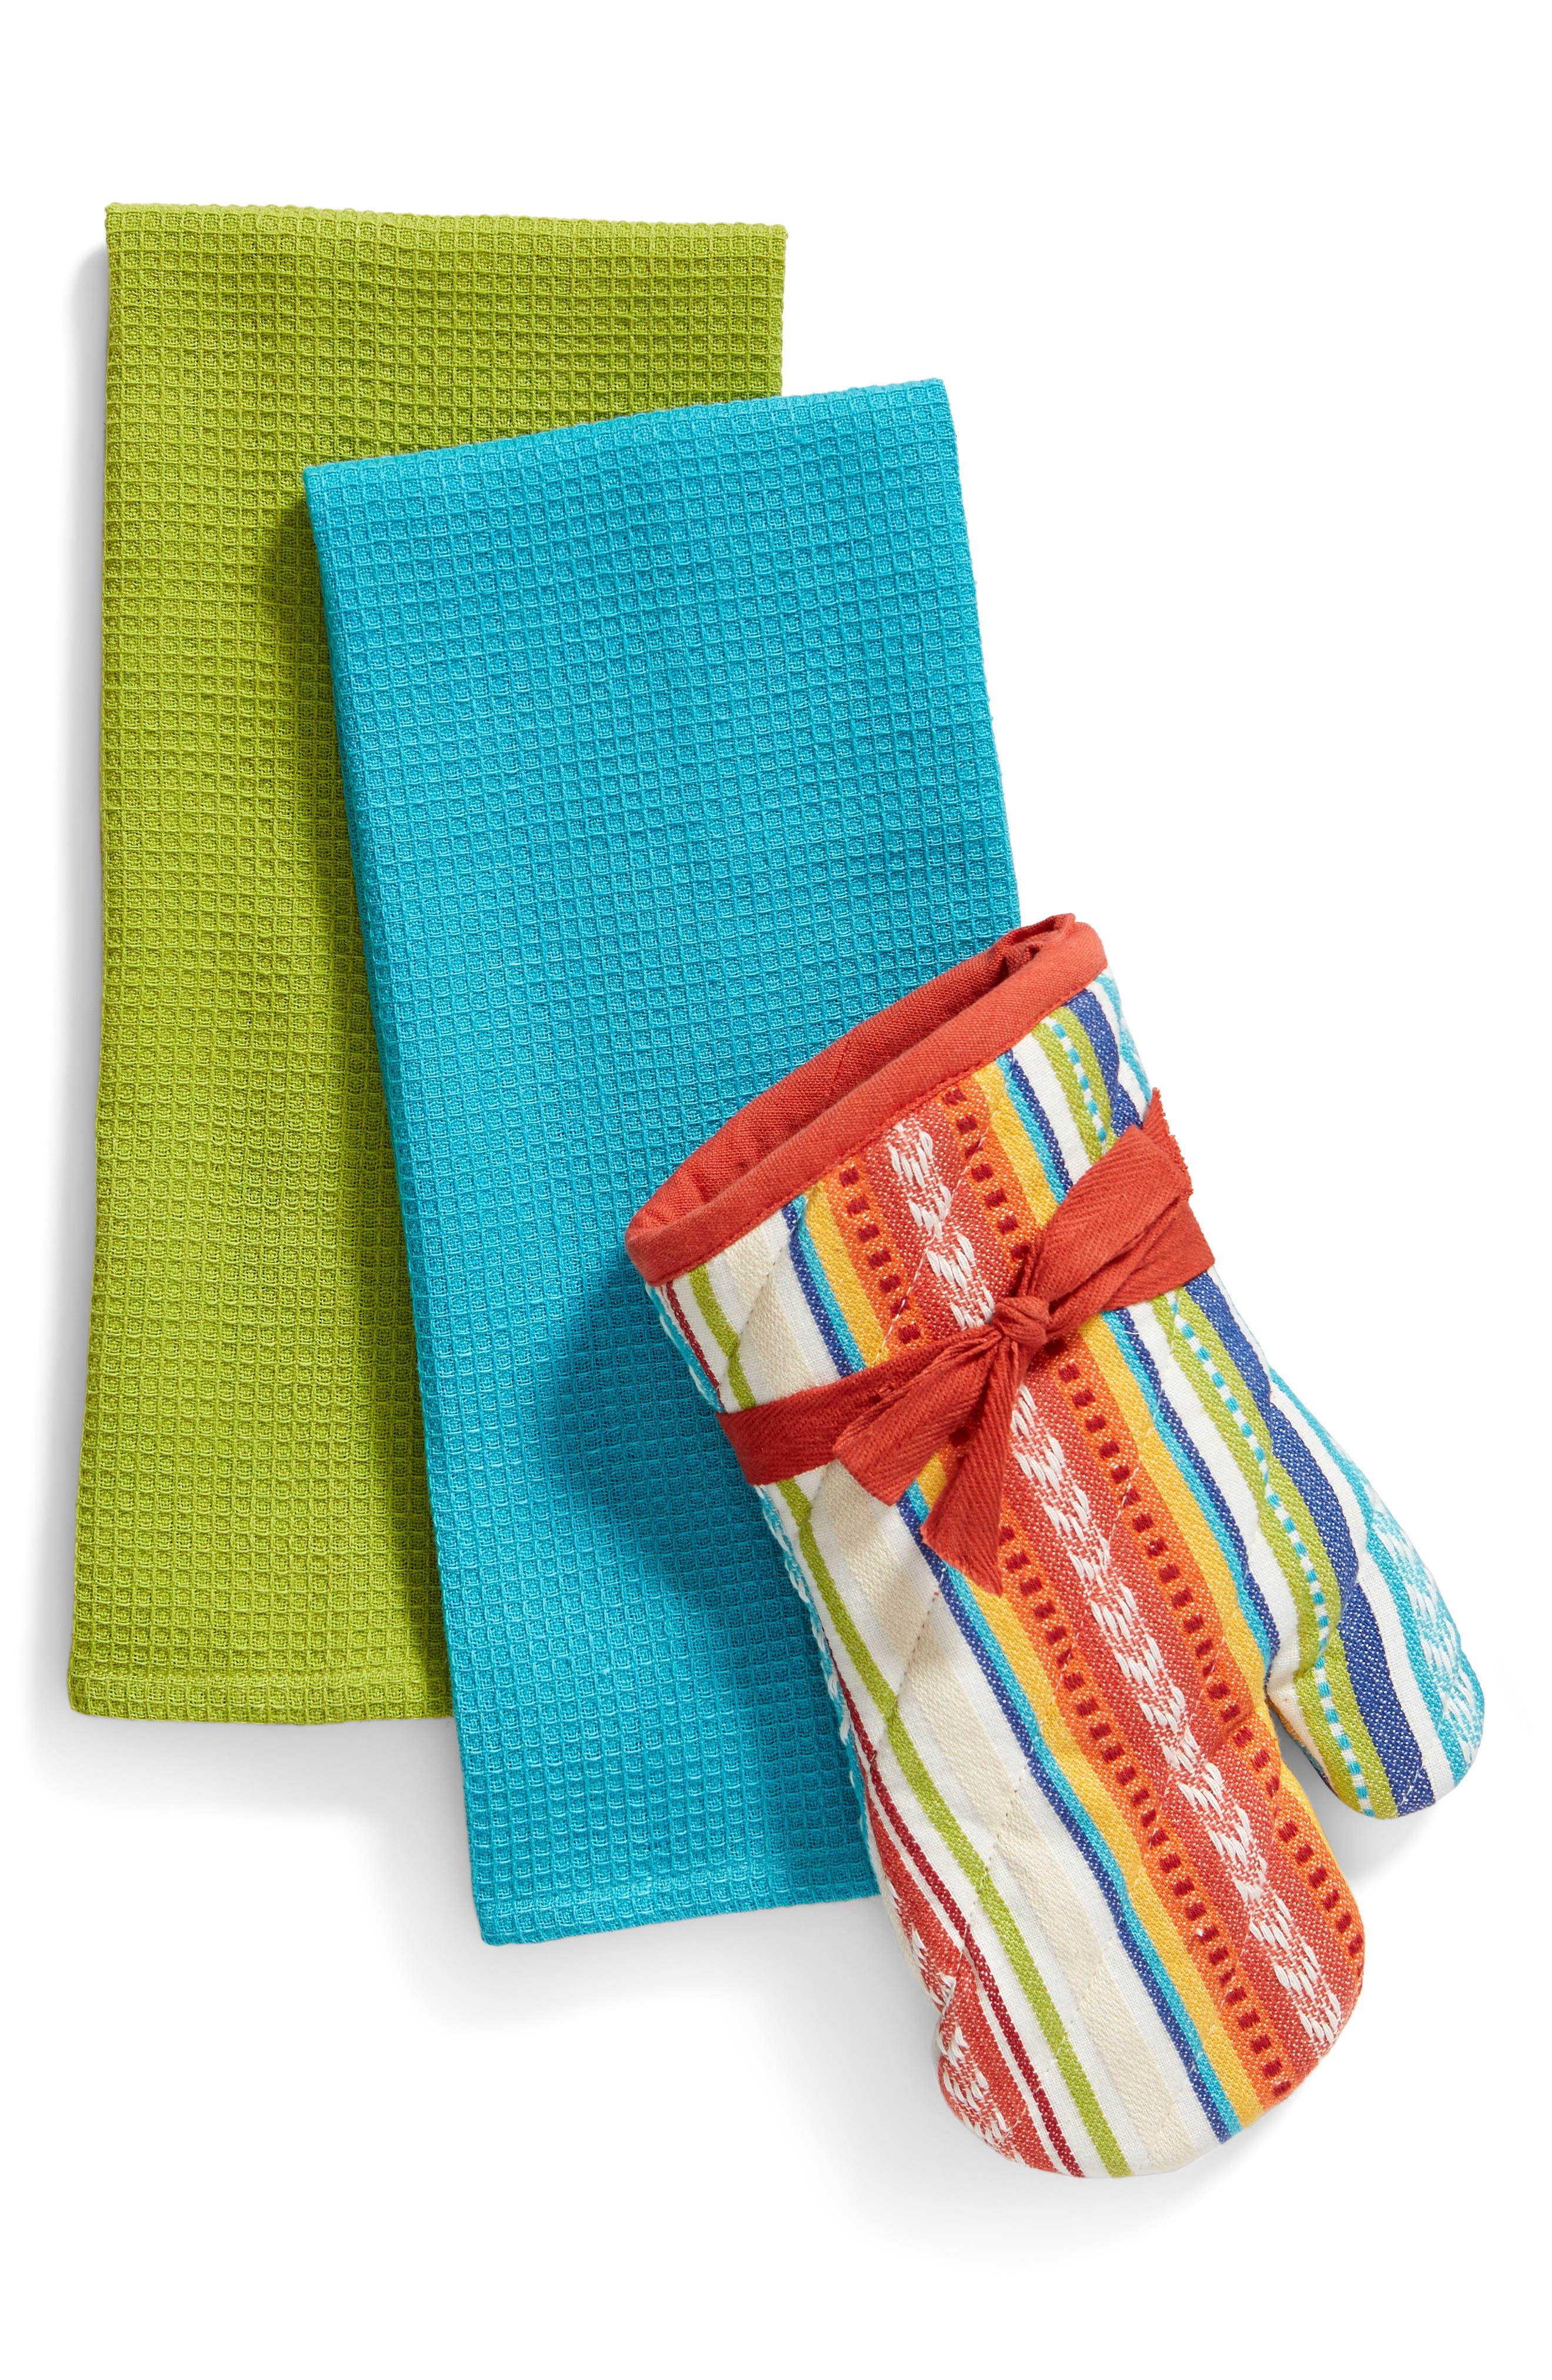 Baja Cantina Oven Mitt & Towel Set,                             Main thumbnail 1, color,                             White